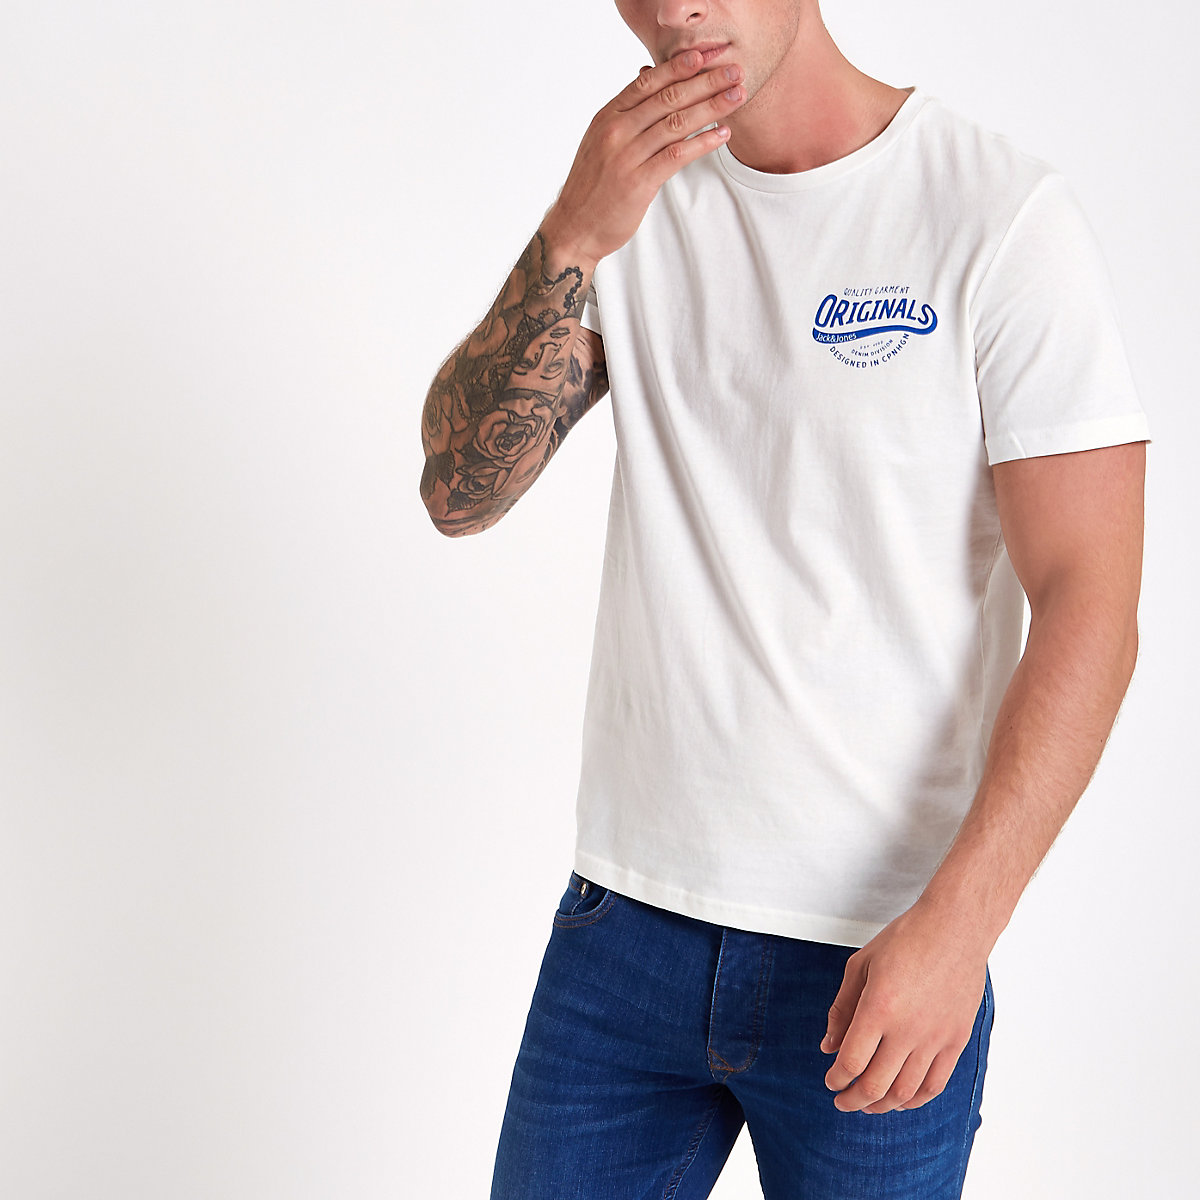 Jack & Jones Originals white print T-shirt